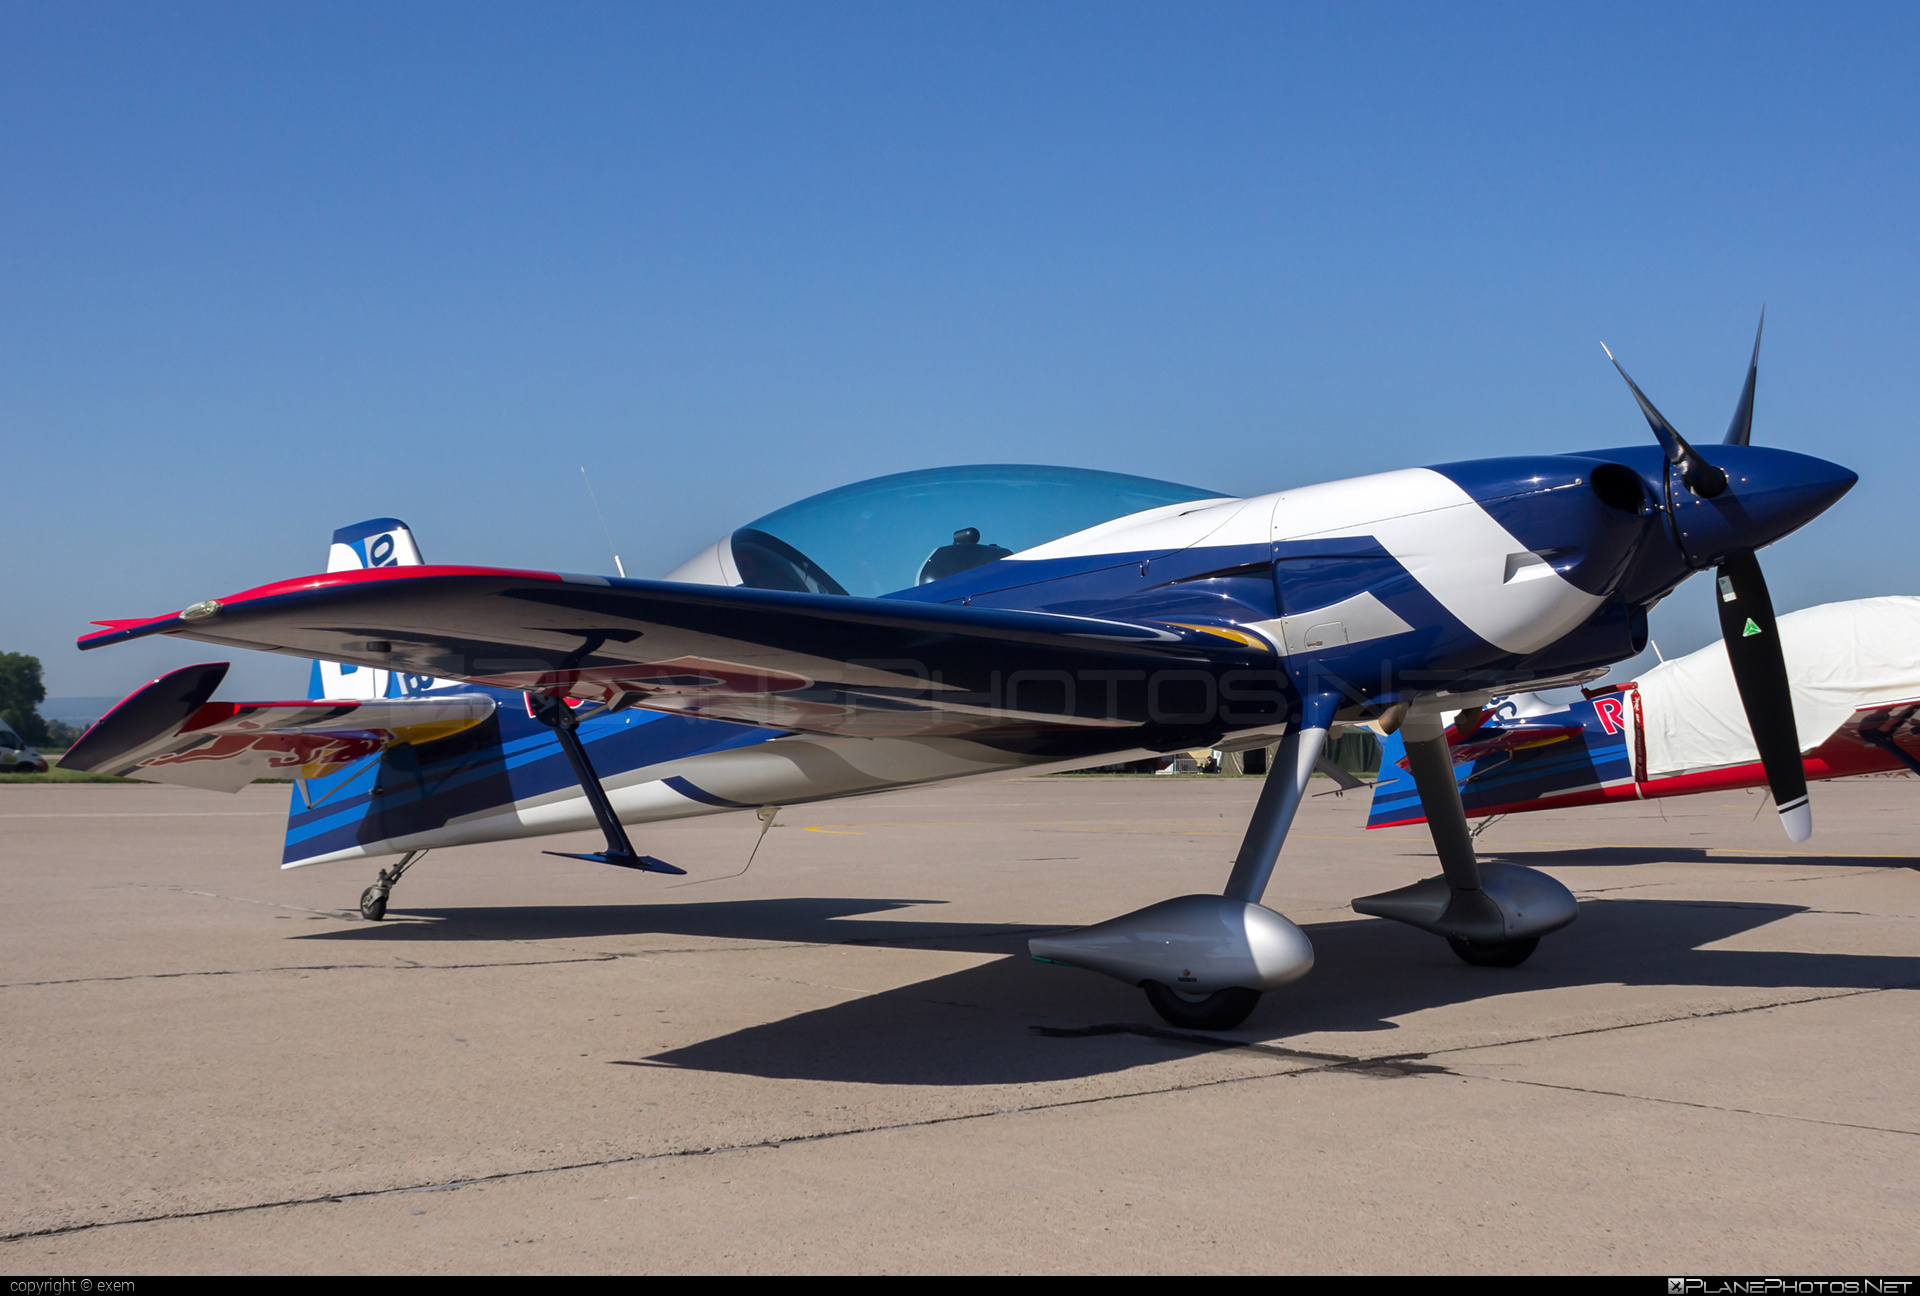 XtremeAir XA42 Sbach 342 - OK-FBB operated by The Flying Bulls Aerobatic Team #sbach #sbach342 #theflyingbullsaerobaticteam #xa42 #xtremeair